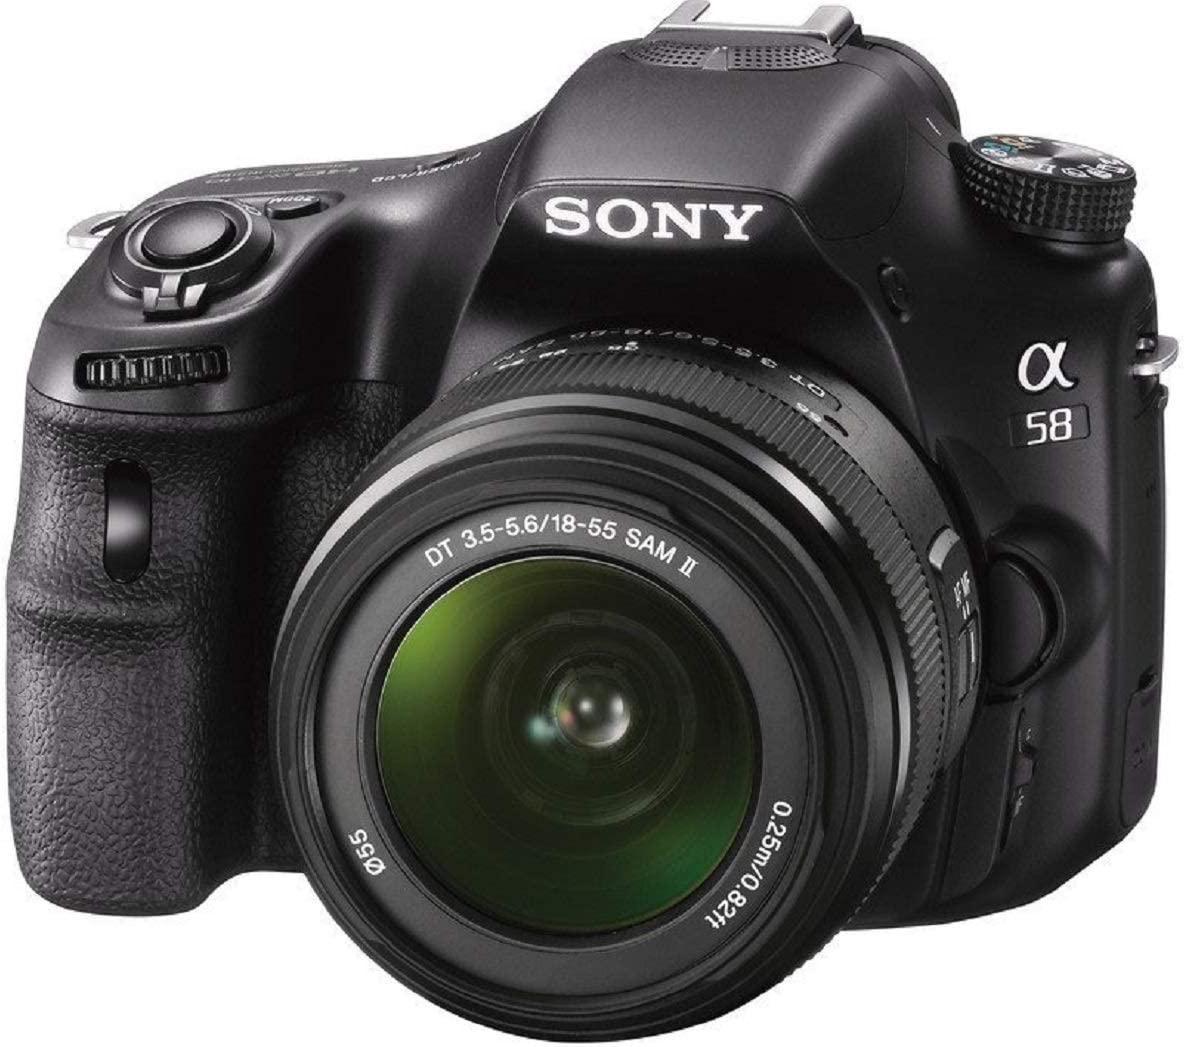 SDHC 2 Pack Sony Alpha DSLR-SLT-A58 Digital Camera Memory Card 2 x 32GB Secure Digital High Capacity Memory Cards